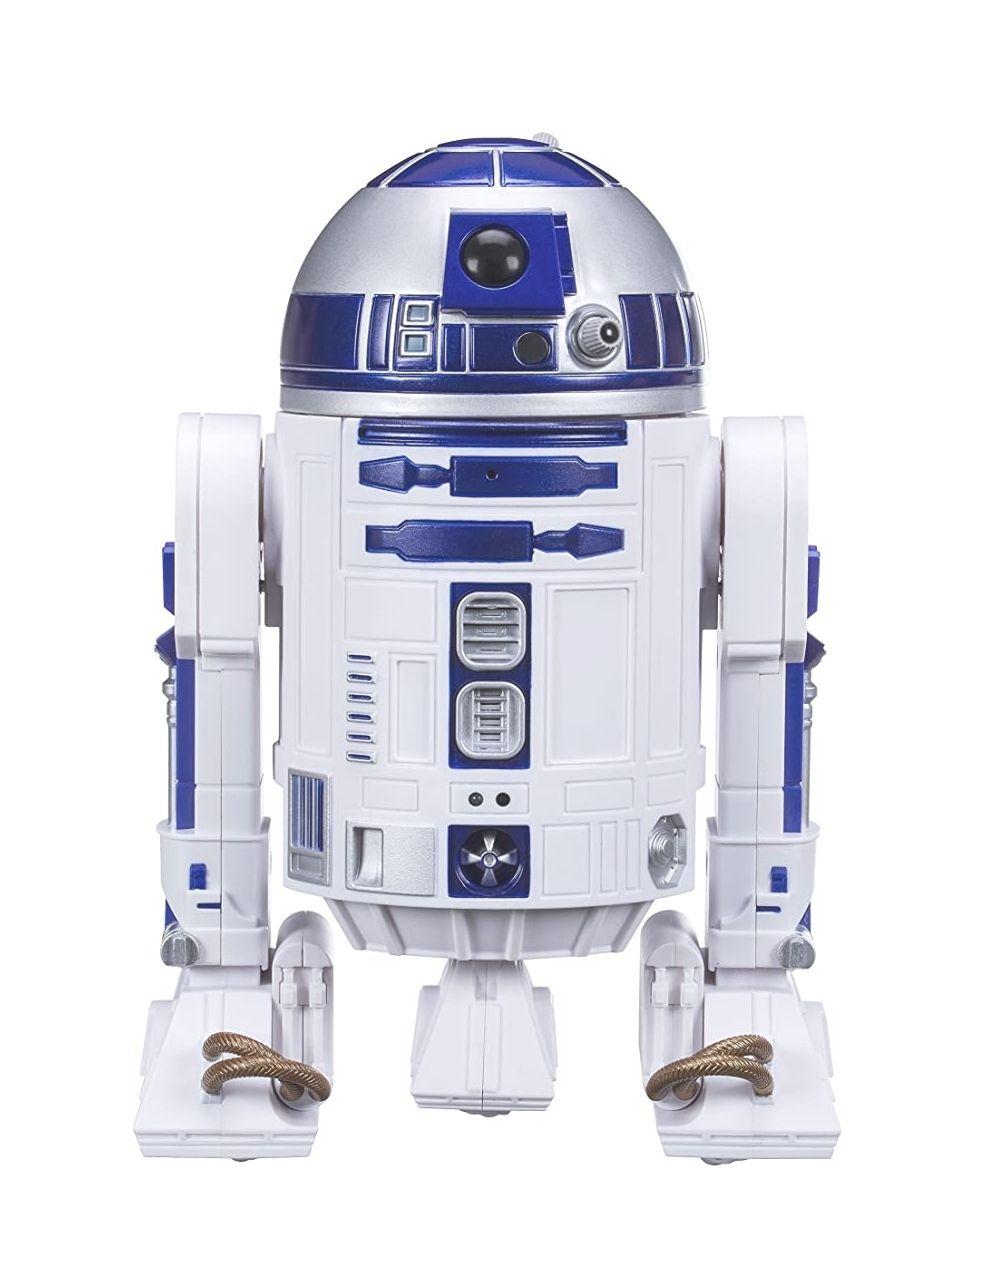 Star Wars E7 Robot inteligente